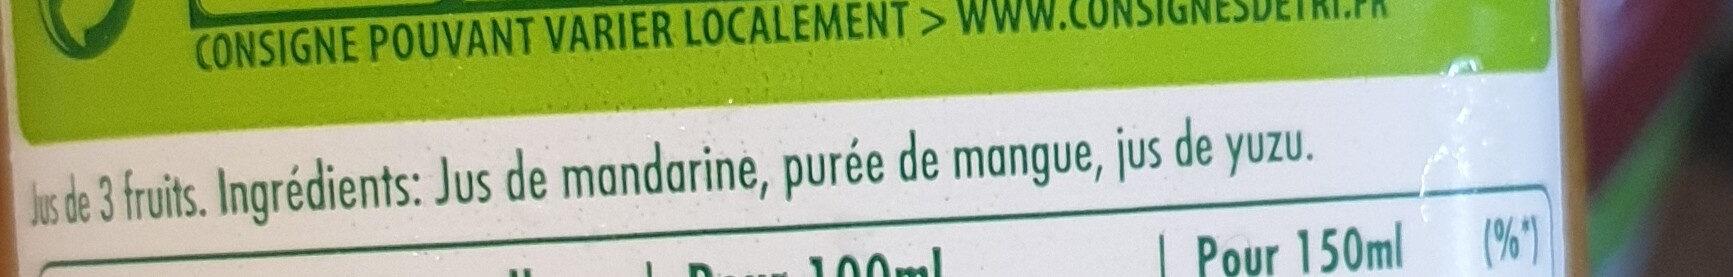 Tropicana Mandarine Mangue Yuzu - Ingrediënten - fr